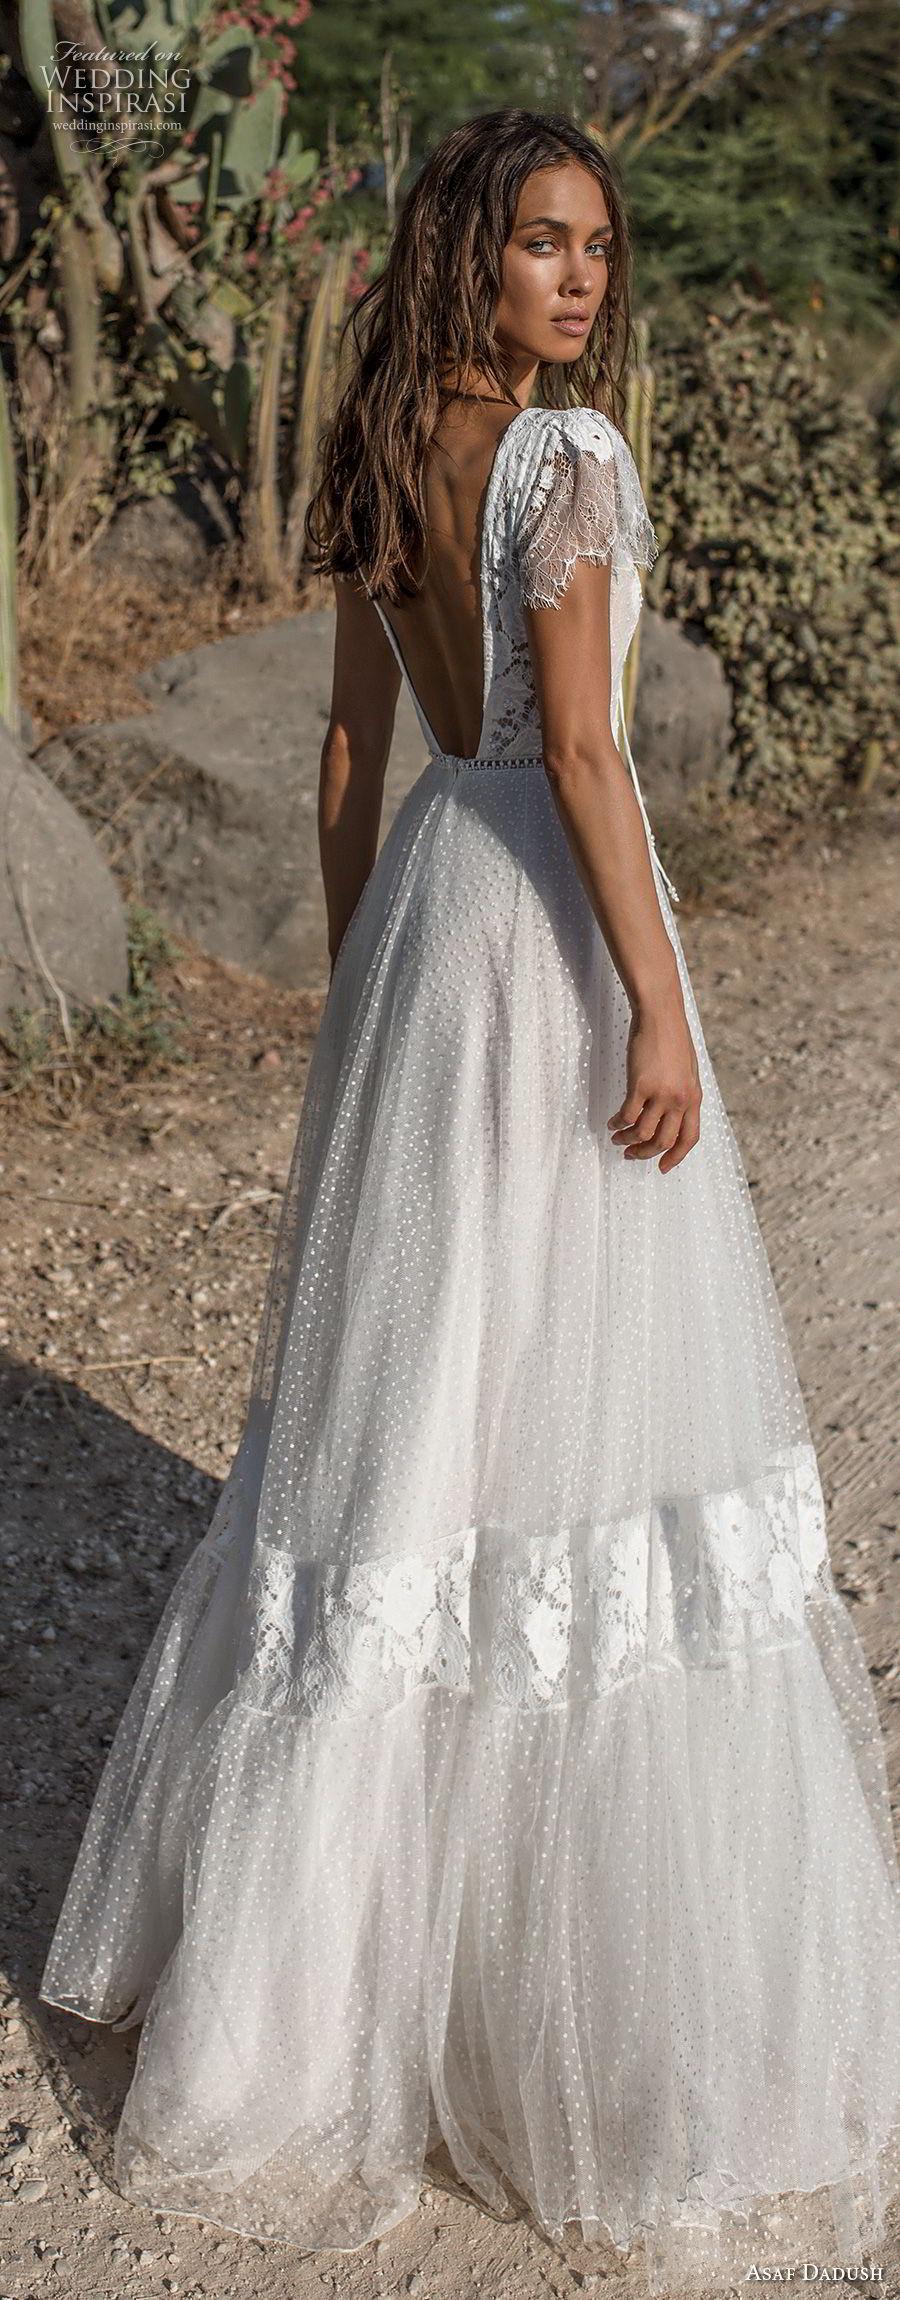 asaf dadush 2018 bridal short butterfly sleeves deep v neck heavily embellished bodice bohemian a  line wedding dress low open back sweep train (7) bv